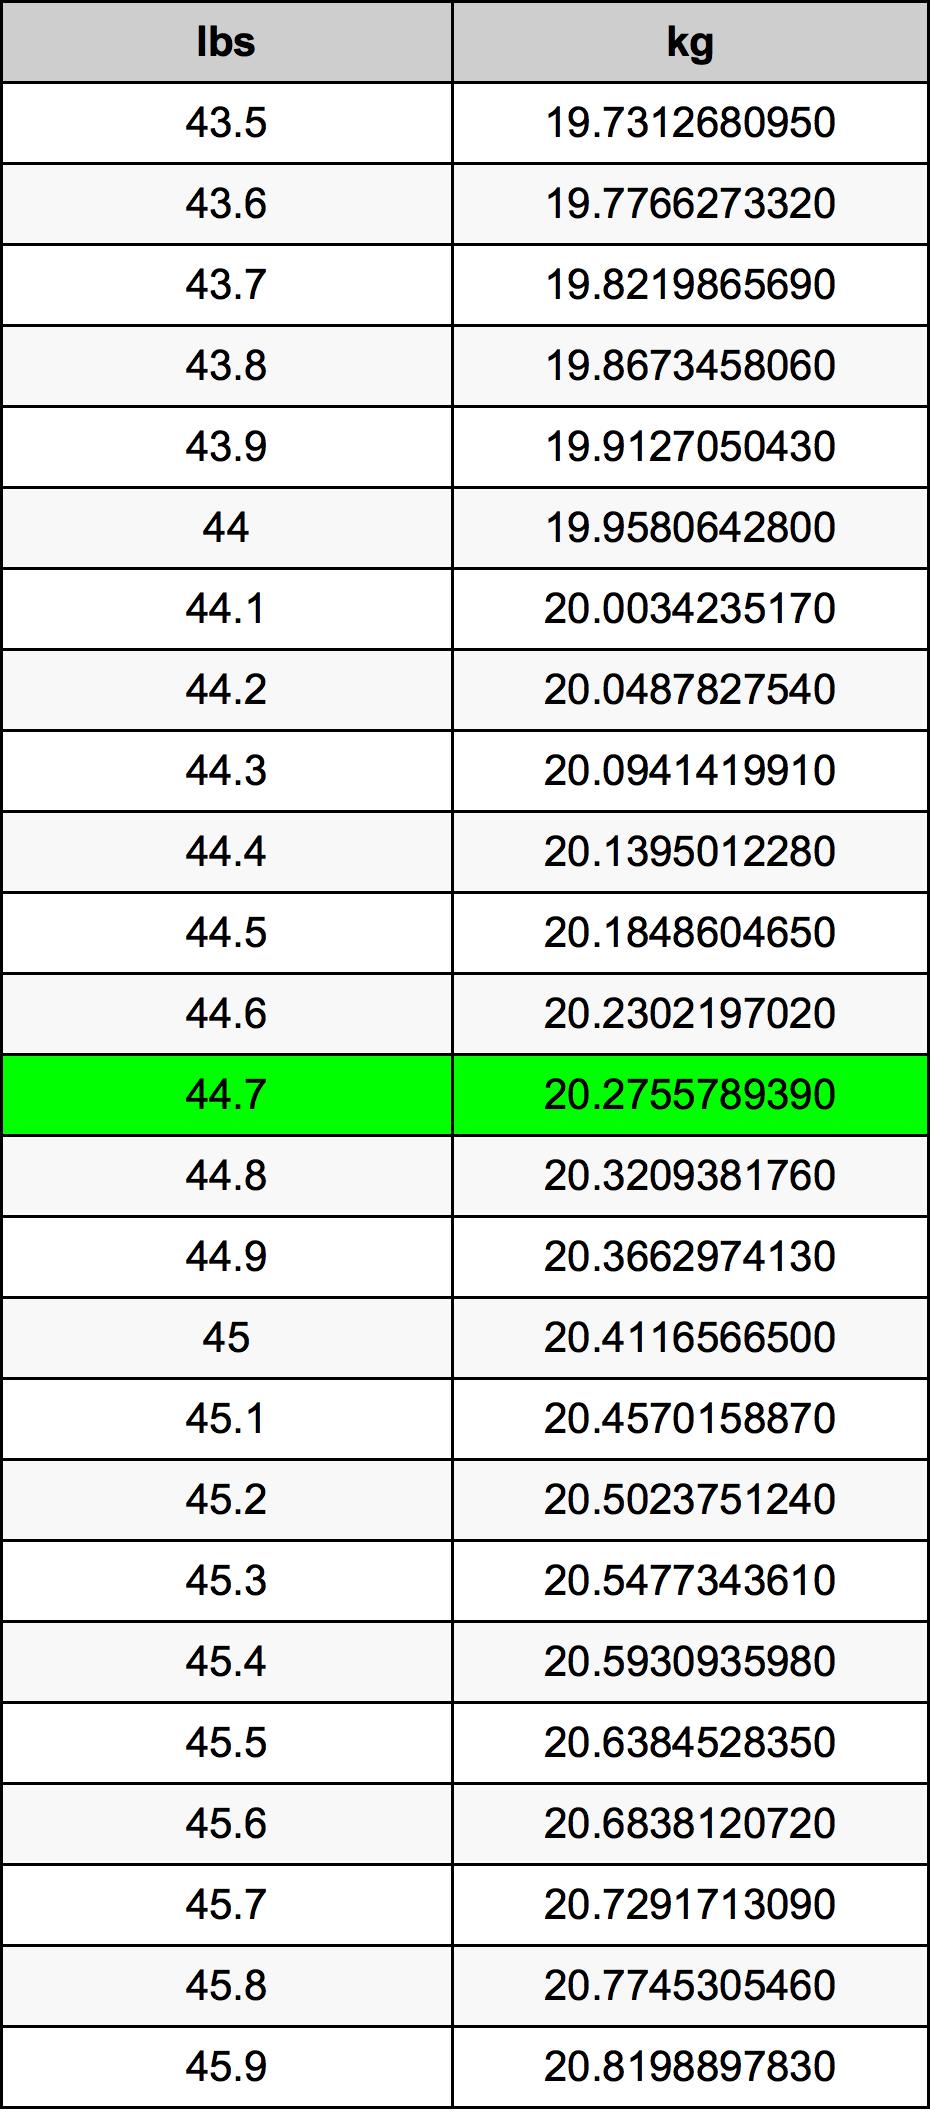 44.7 Pon konversi tabel